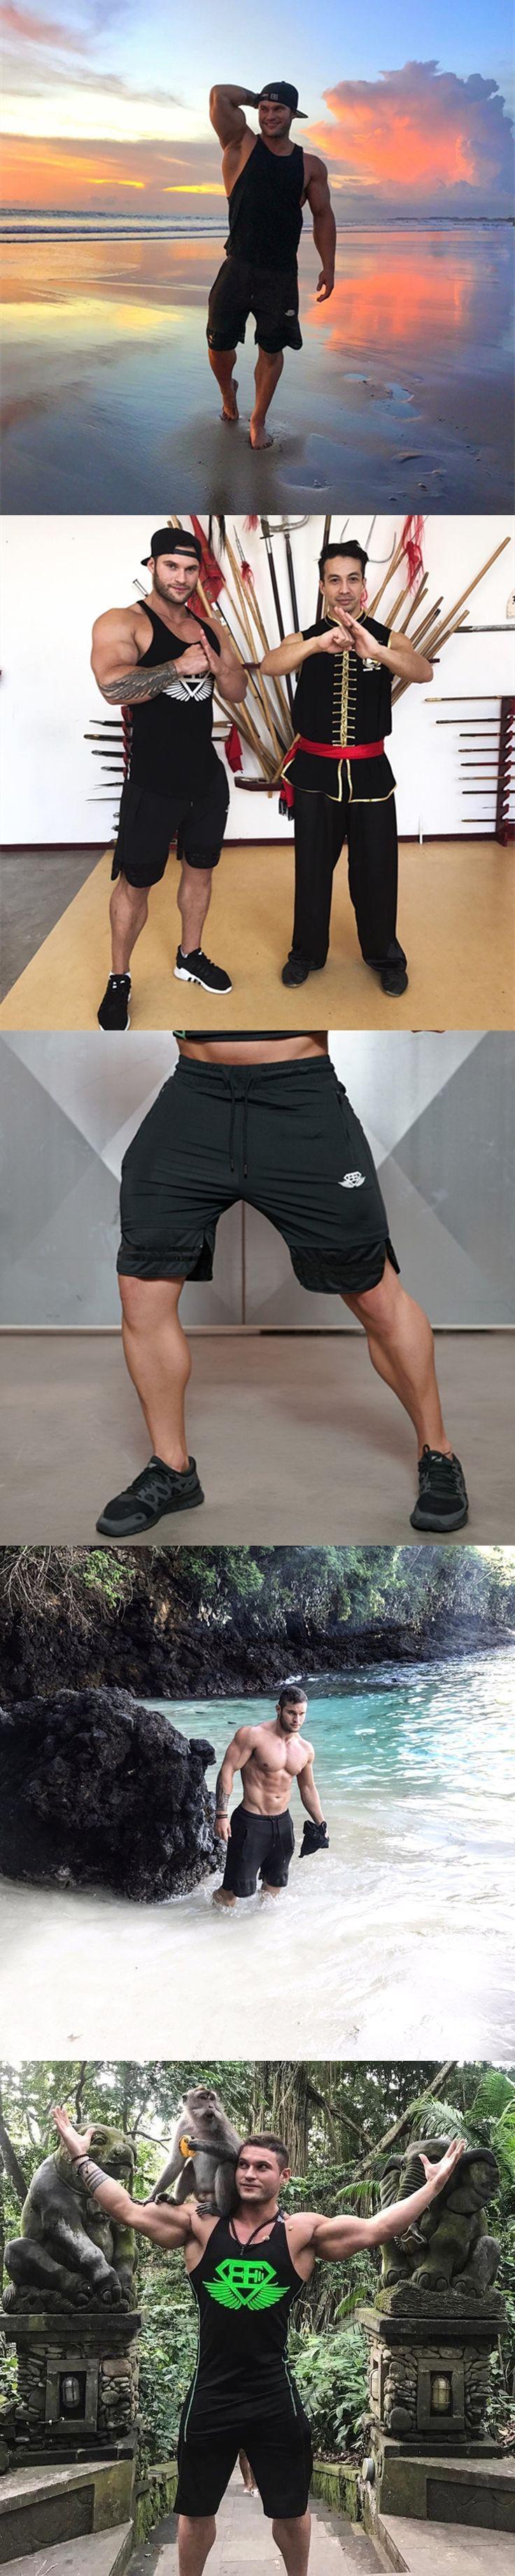 Fashion Men New Sporting Shorts Trousers Sweatpants Fitness Short Jogger Casual Gyms Black Short Pants